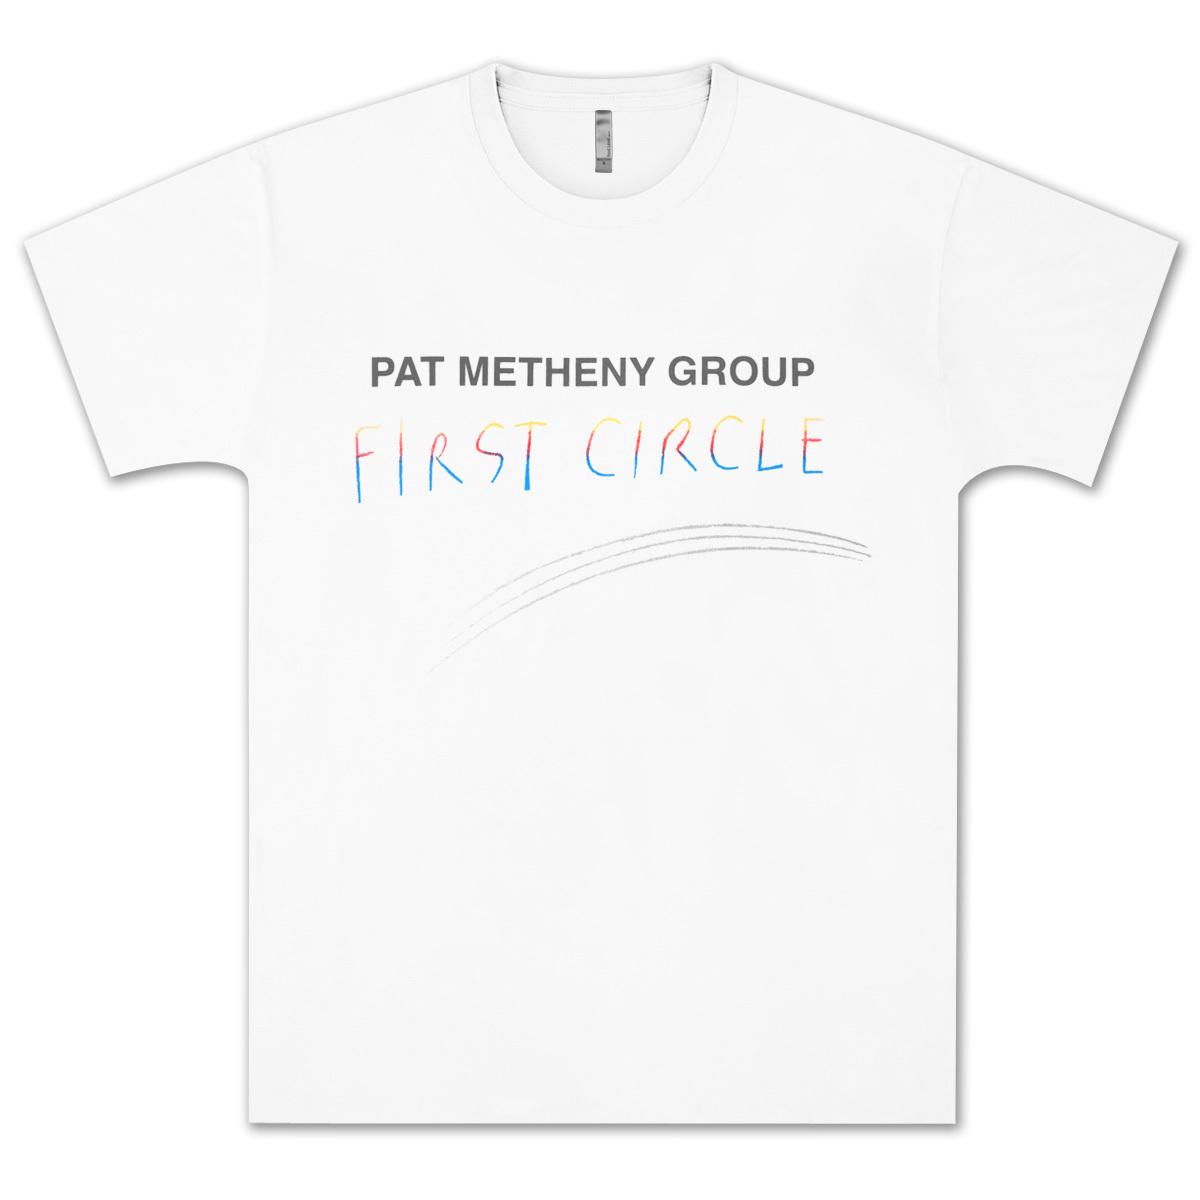 Pat Metheny First Circle T-Shirt